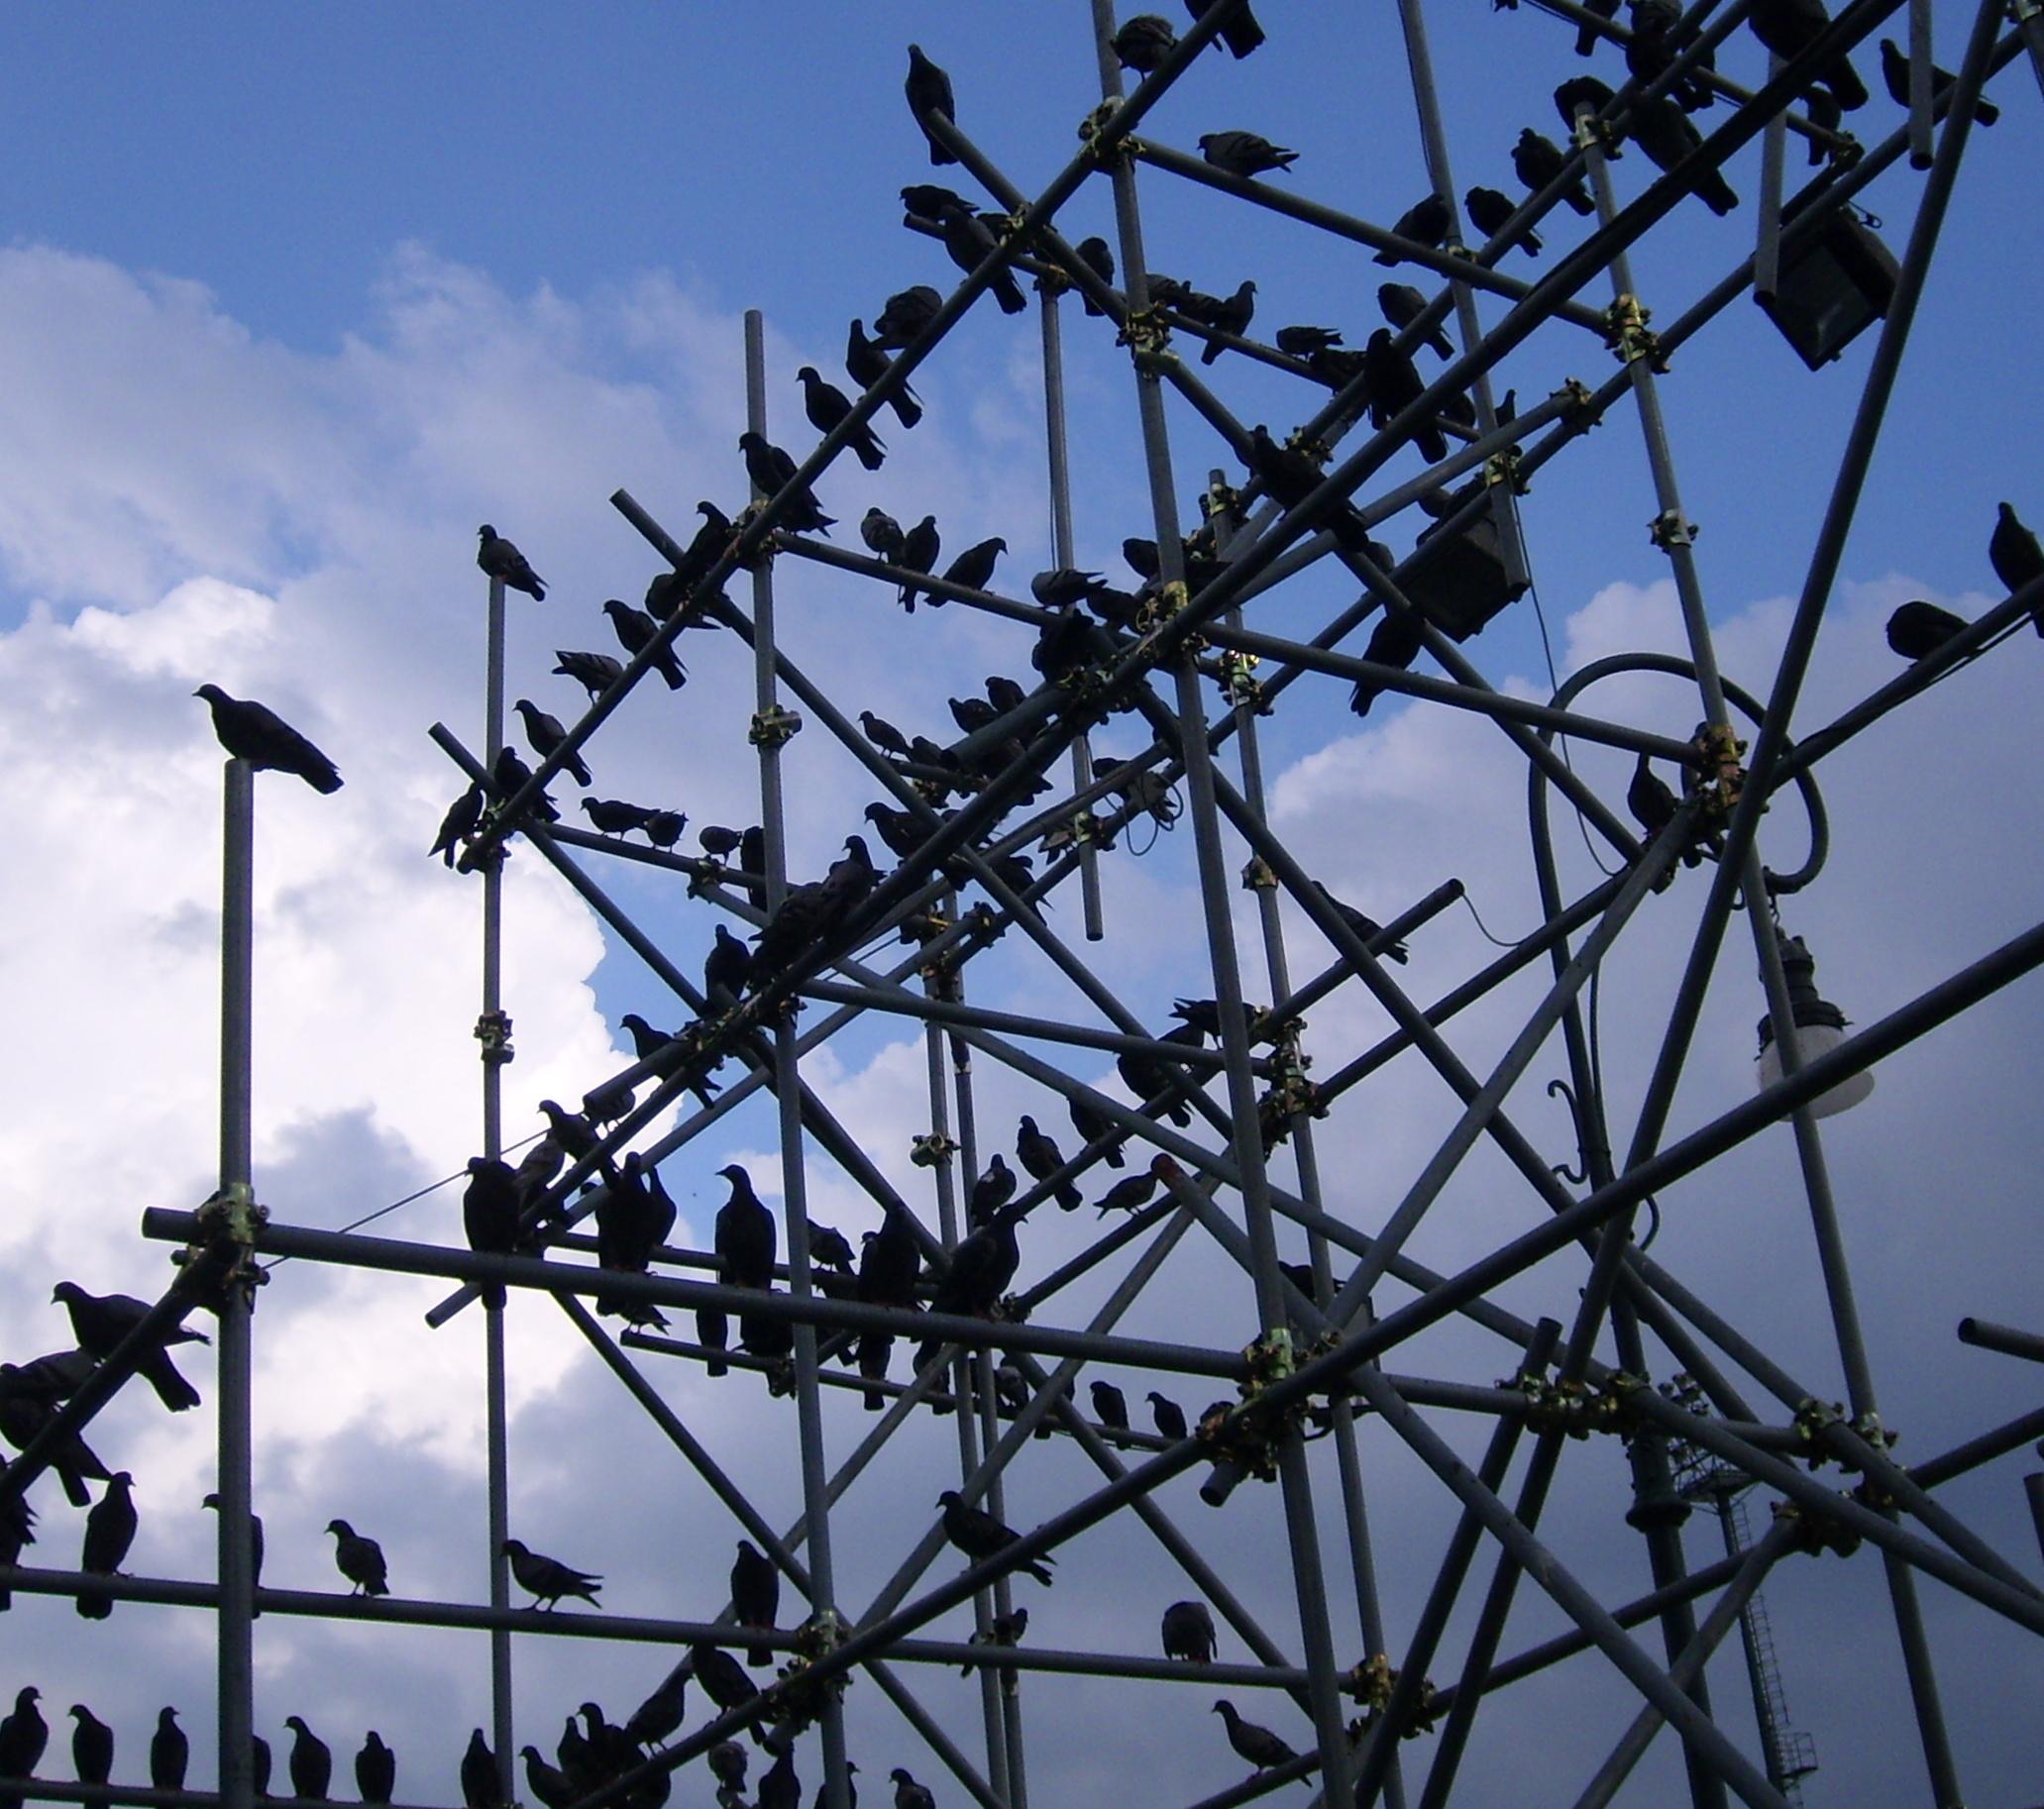 Birds, Scaffold, Trellis, Pigeons, Many, HQ Photo